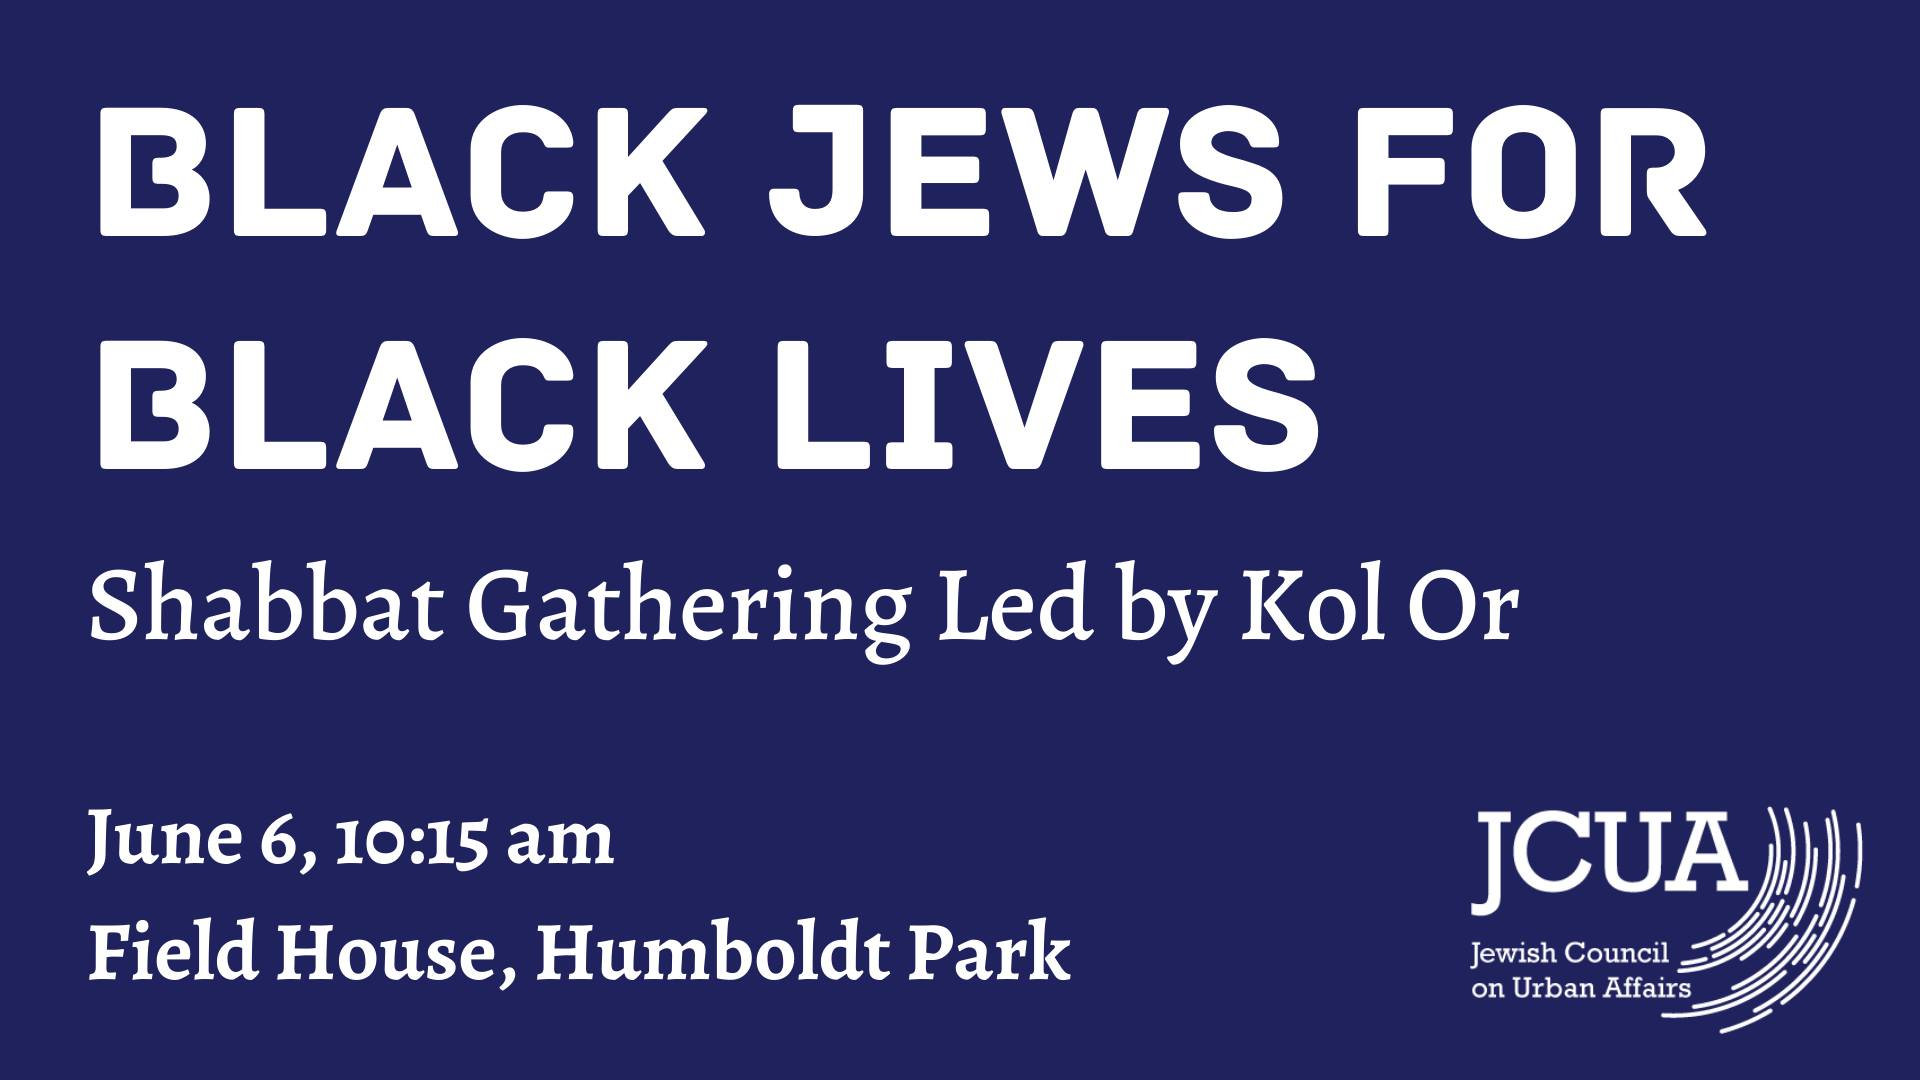 chitribe Jewish Council on Urban AffairsBlack Jews for Black Lives: Shabbat Gathering with Kol Or